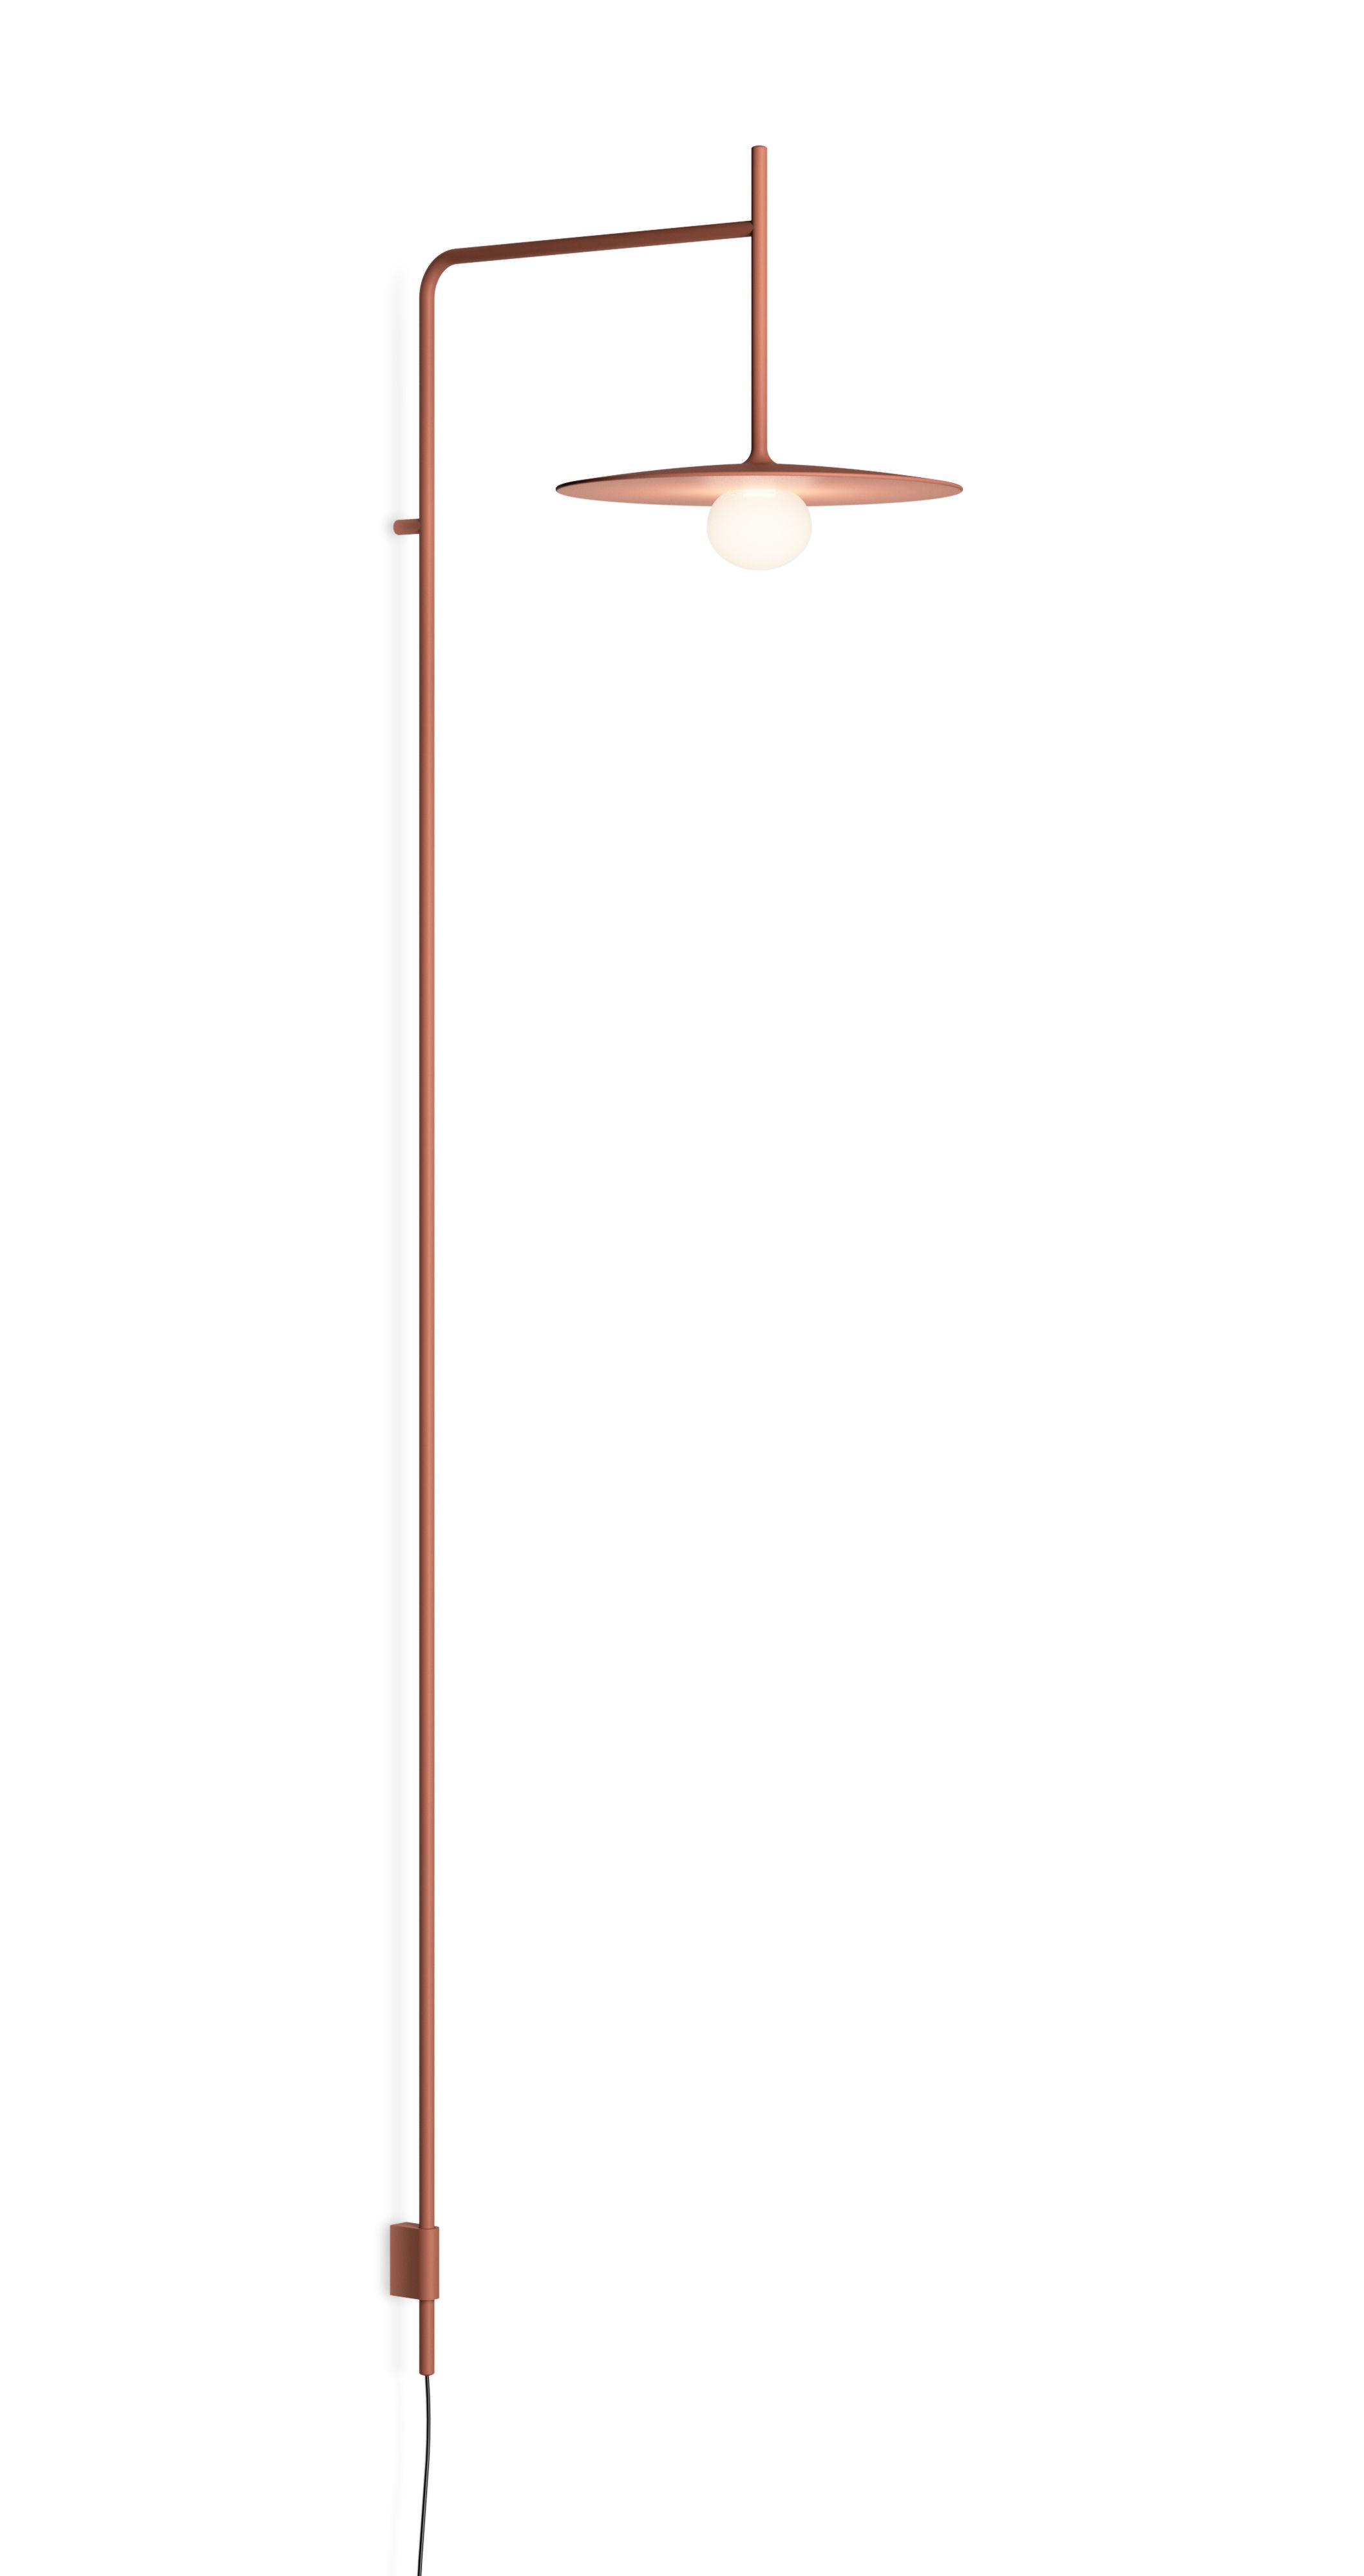 Leuchten - Wandleuchten - Tempo Disque Wandleuchte mit Stromkabel / LED - feststehender Arm L 42,5 cm - Vibia - Terrakotta - geblasenes Glas, lackierter Stahl, lackiertes Aluminium